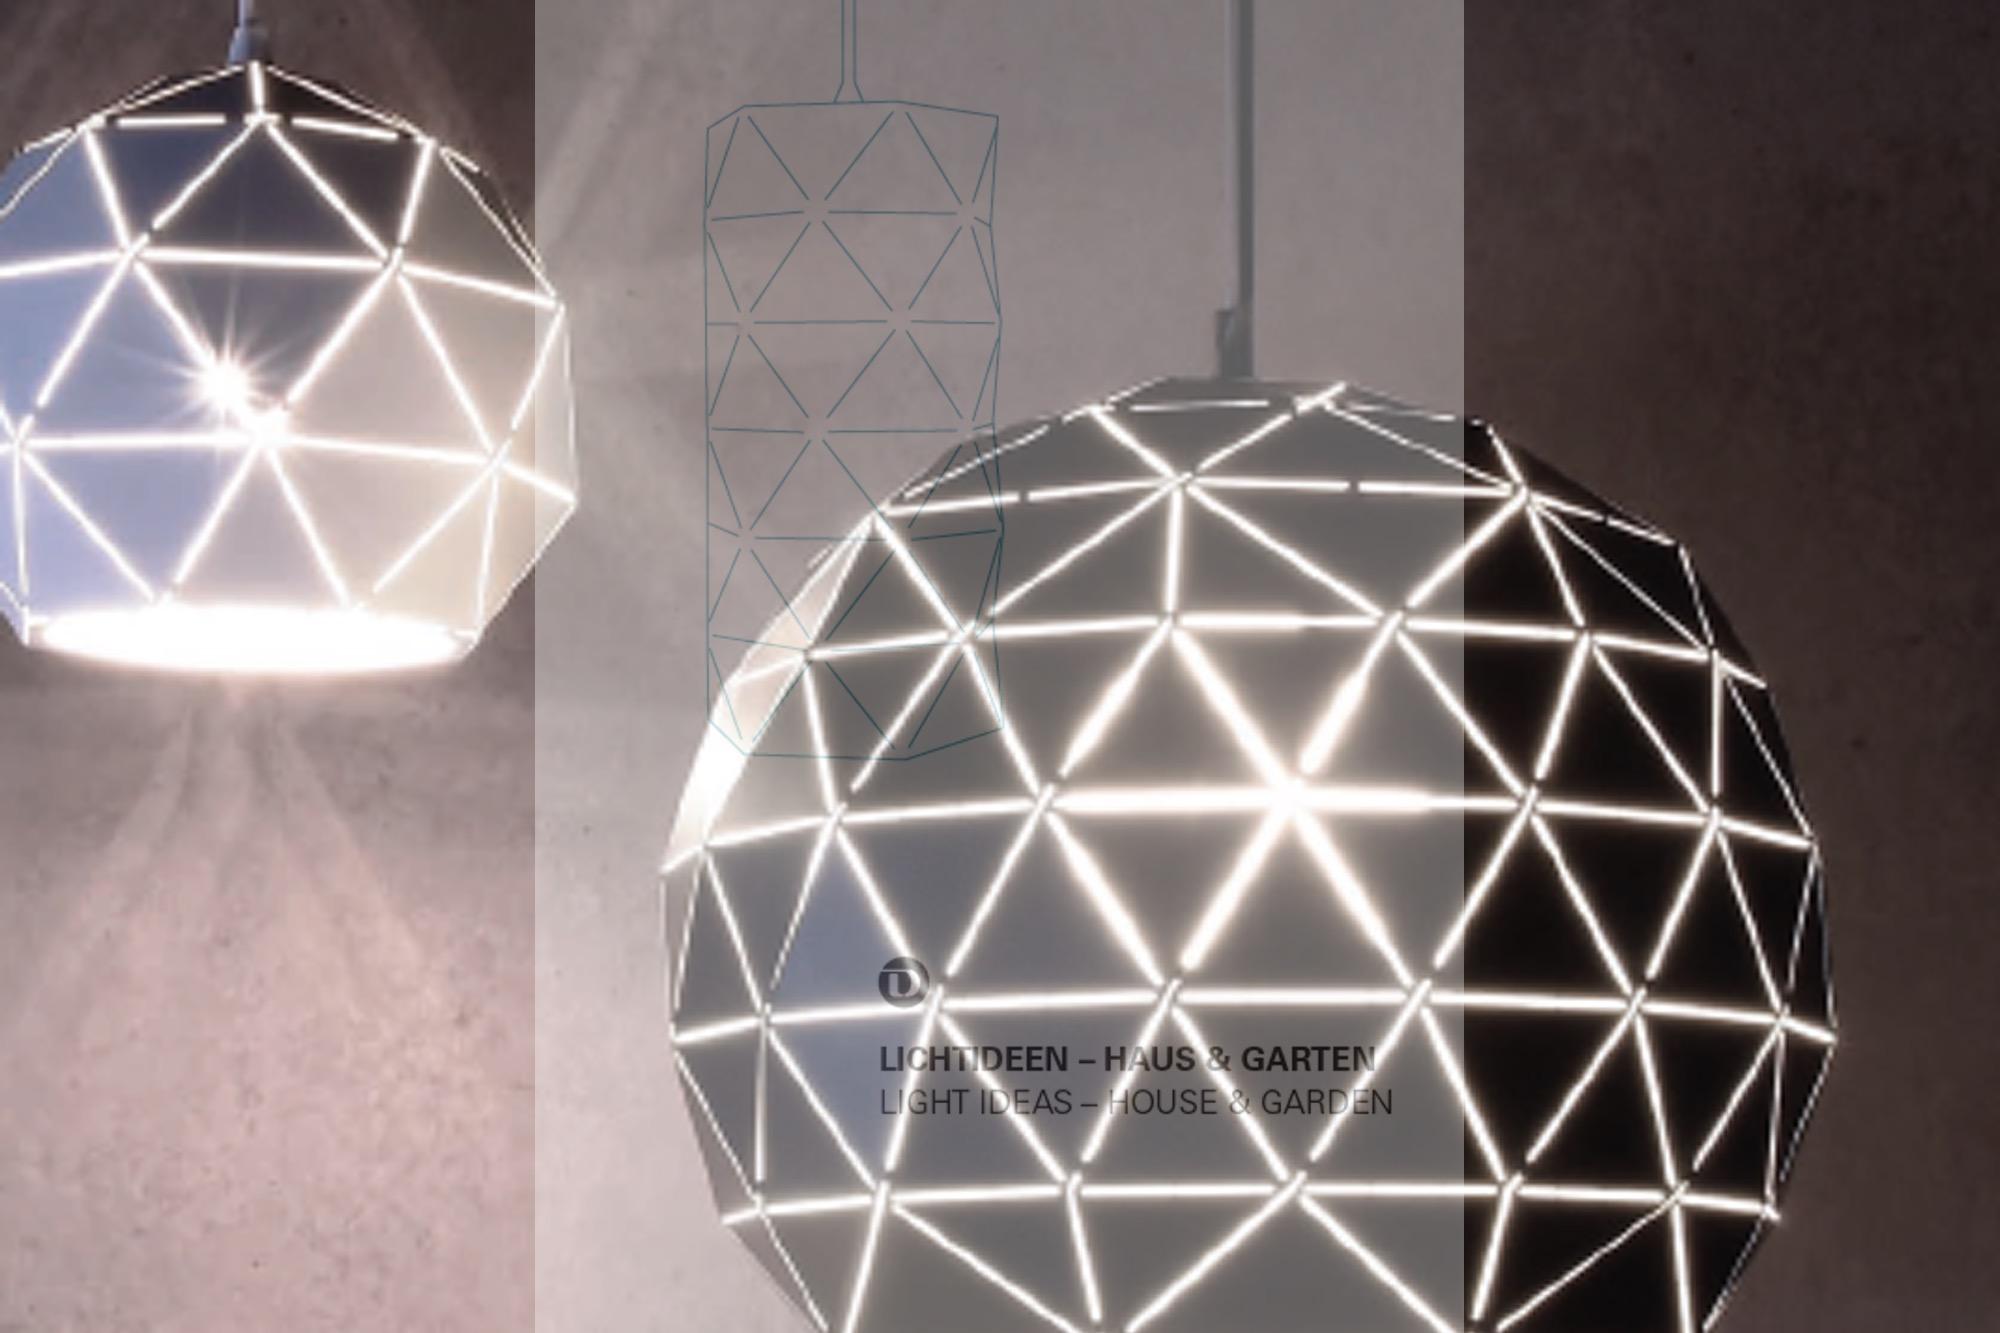 Light Ideas 2019/2020